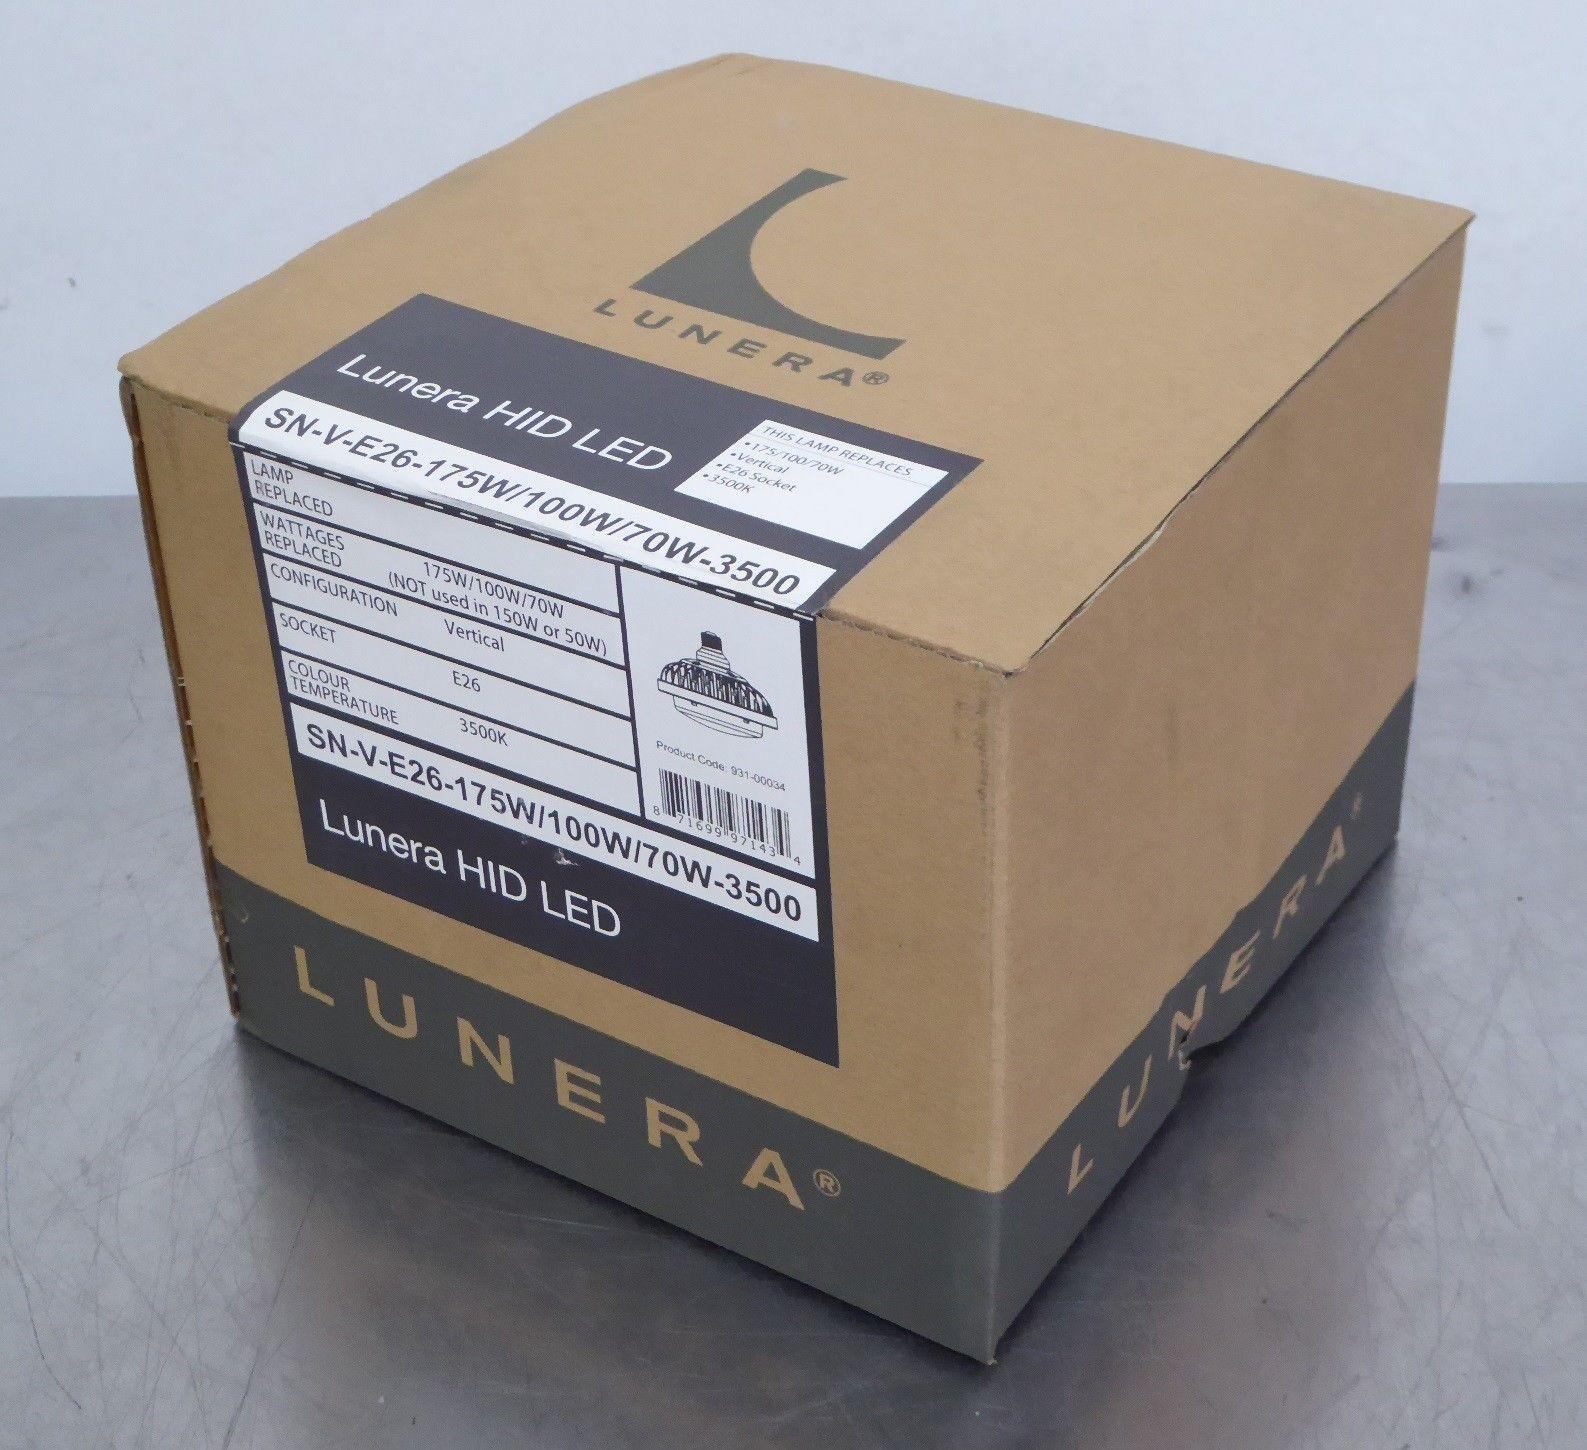 TB Lunera Susan HID LED SN-V-E26-175W/100W/70W-3500 Lamp, E26 Socket, 3500K